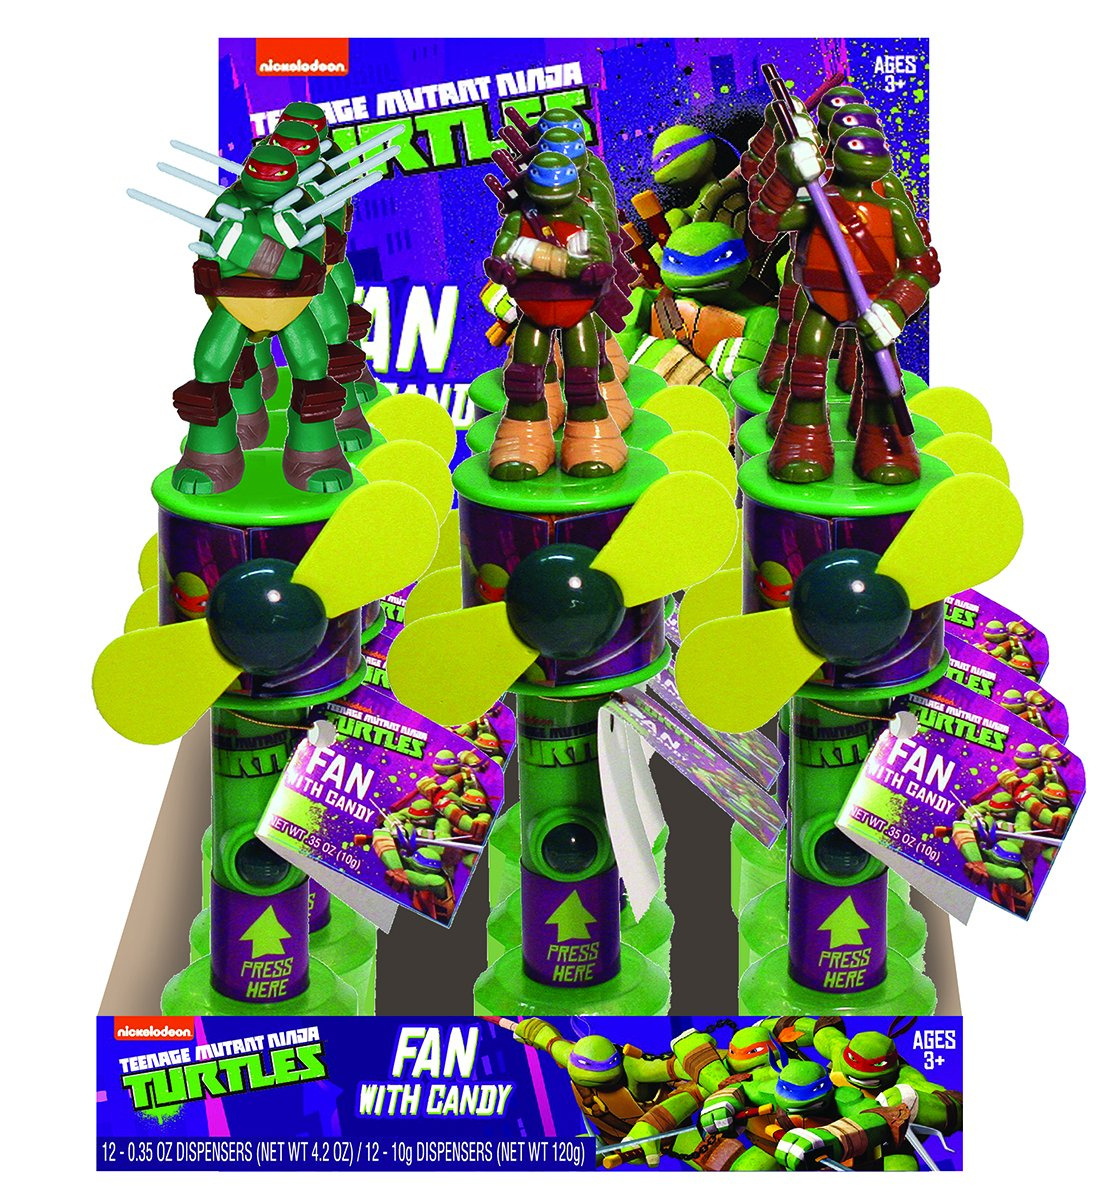 Amazon.com : Nickelodeon Tmnt Candy Fan, 0.35 Ounce ...